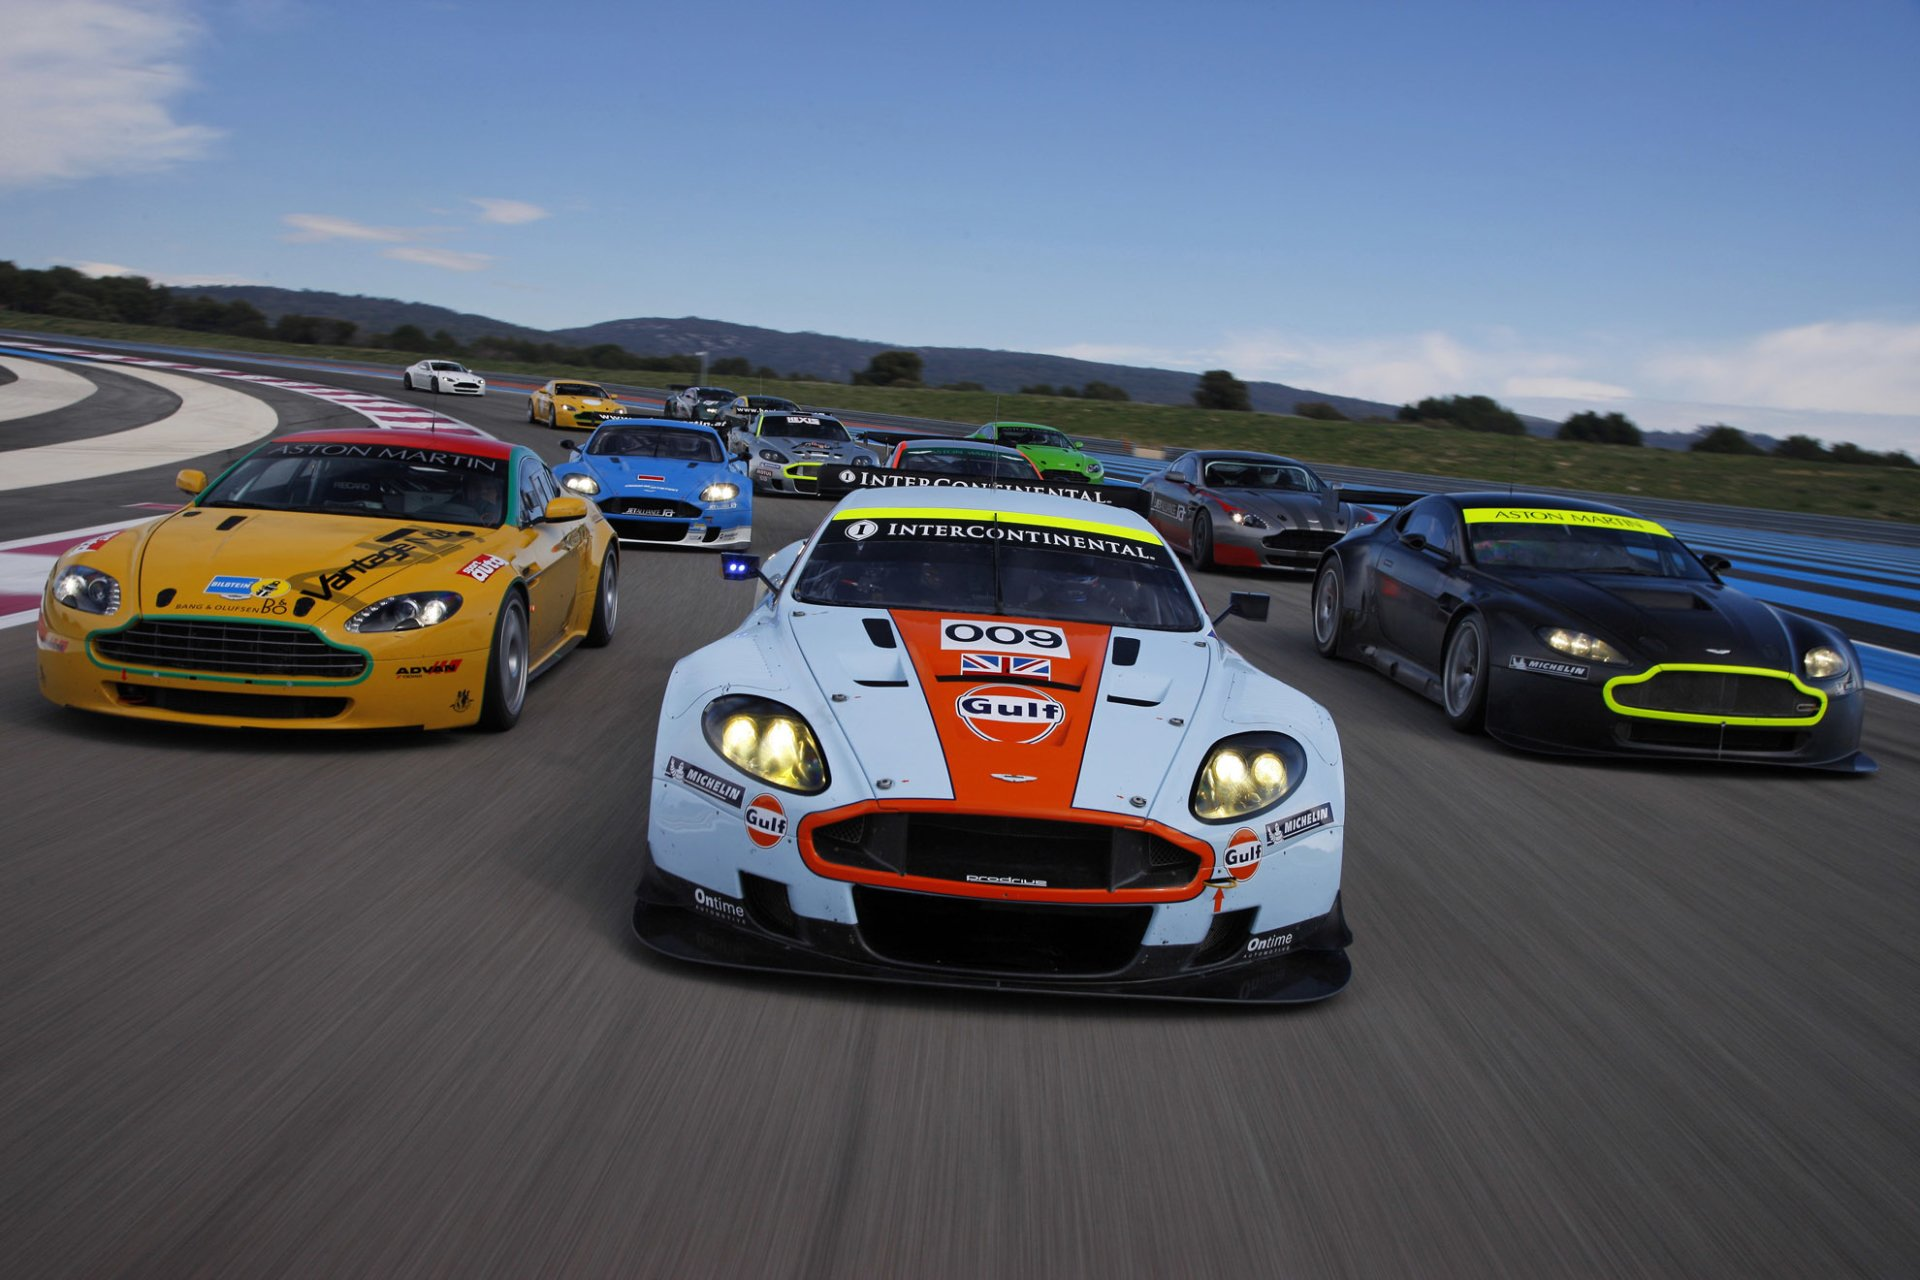 Vehicles - Aston Martin DBR9  Wallpaper